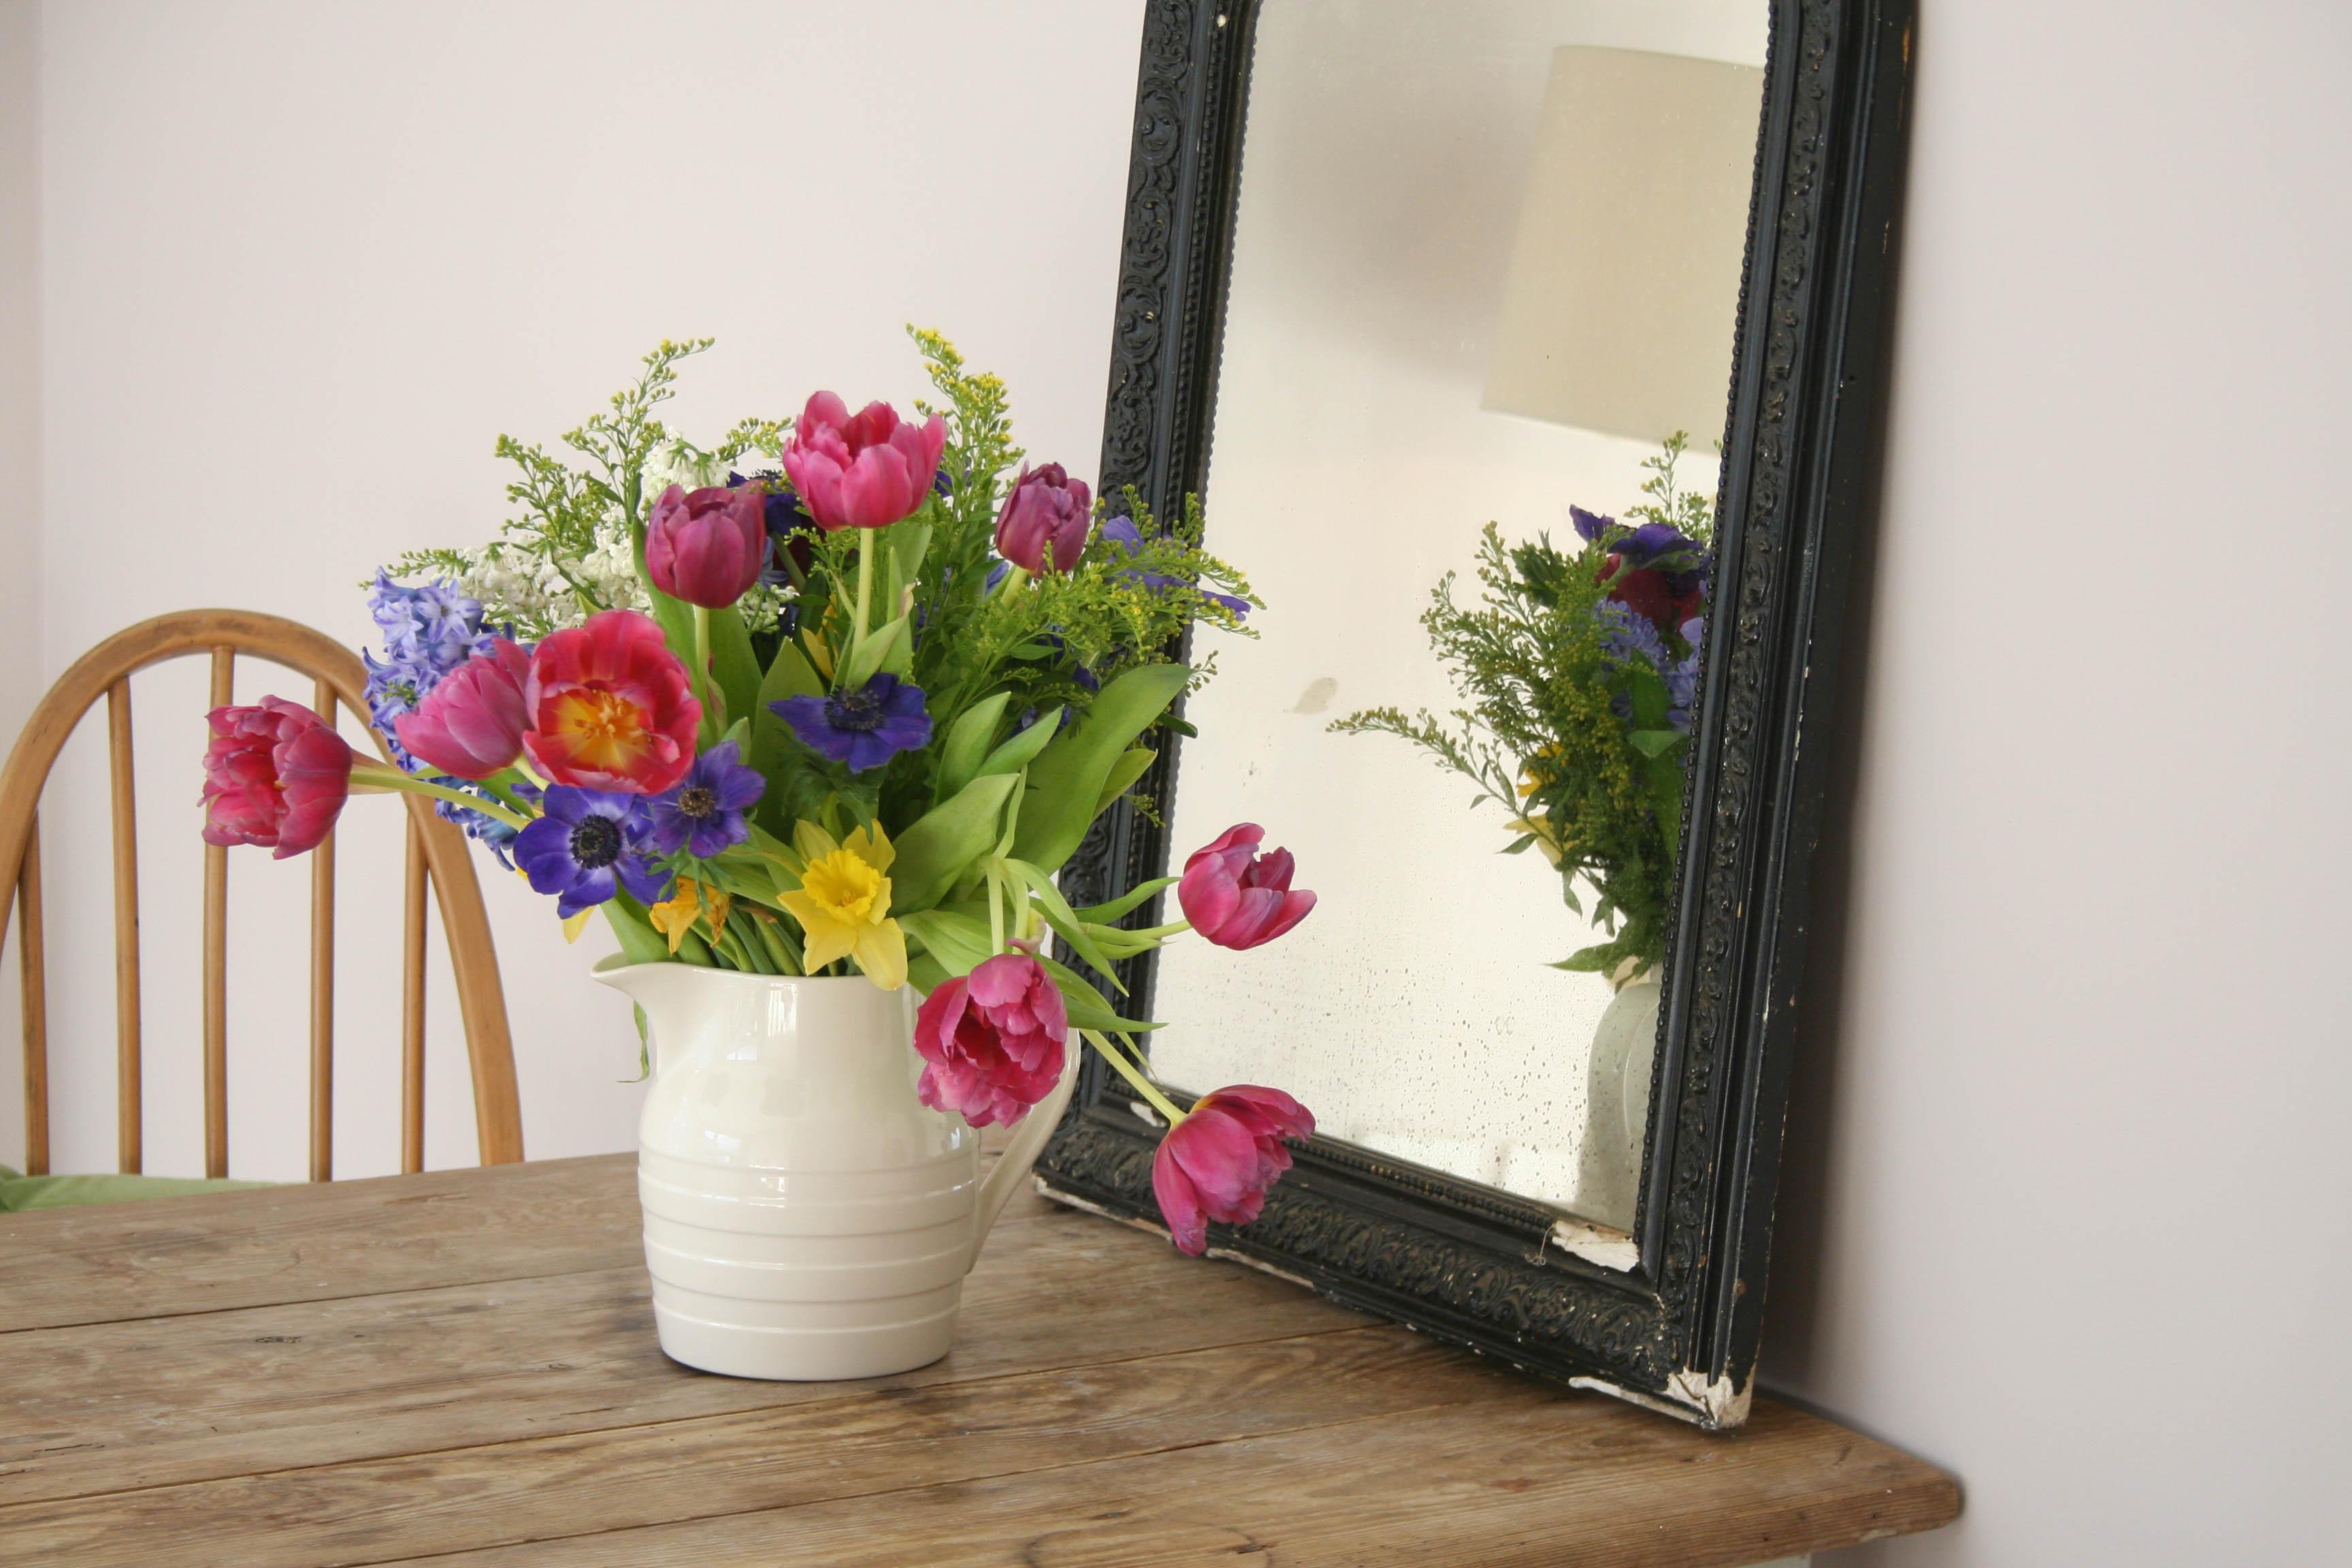 Styling the Seasons - February | New Farrow & Ball colour - Peignoir | Apartment Apothecary